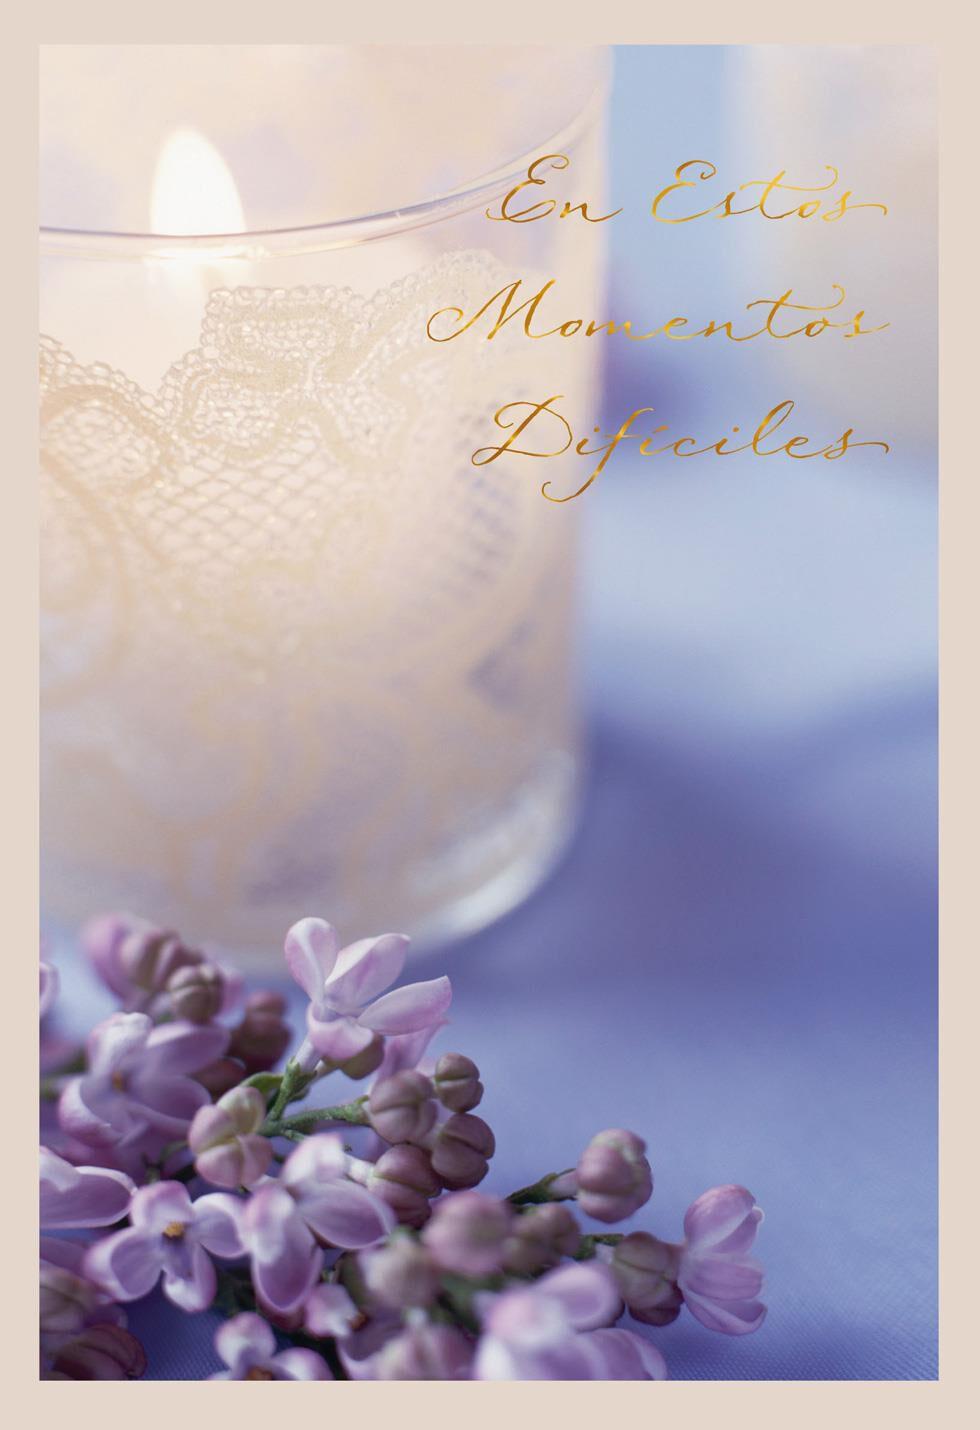 Lavender and lace spanish language sympathy card greeting cards lavender and lace spanish language sympathy card greeting cards hallmark kristyandbryce Choice Image